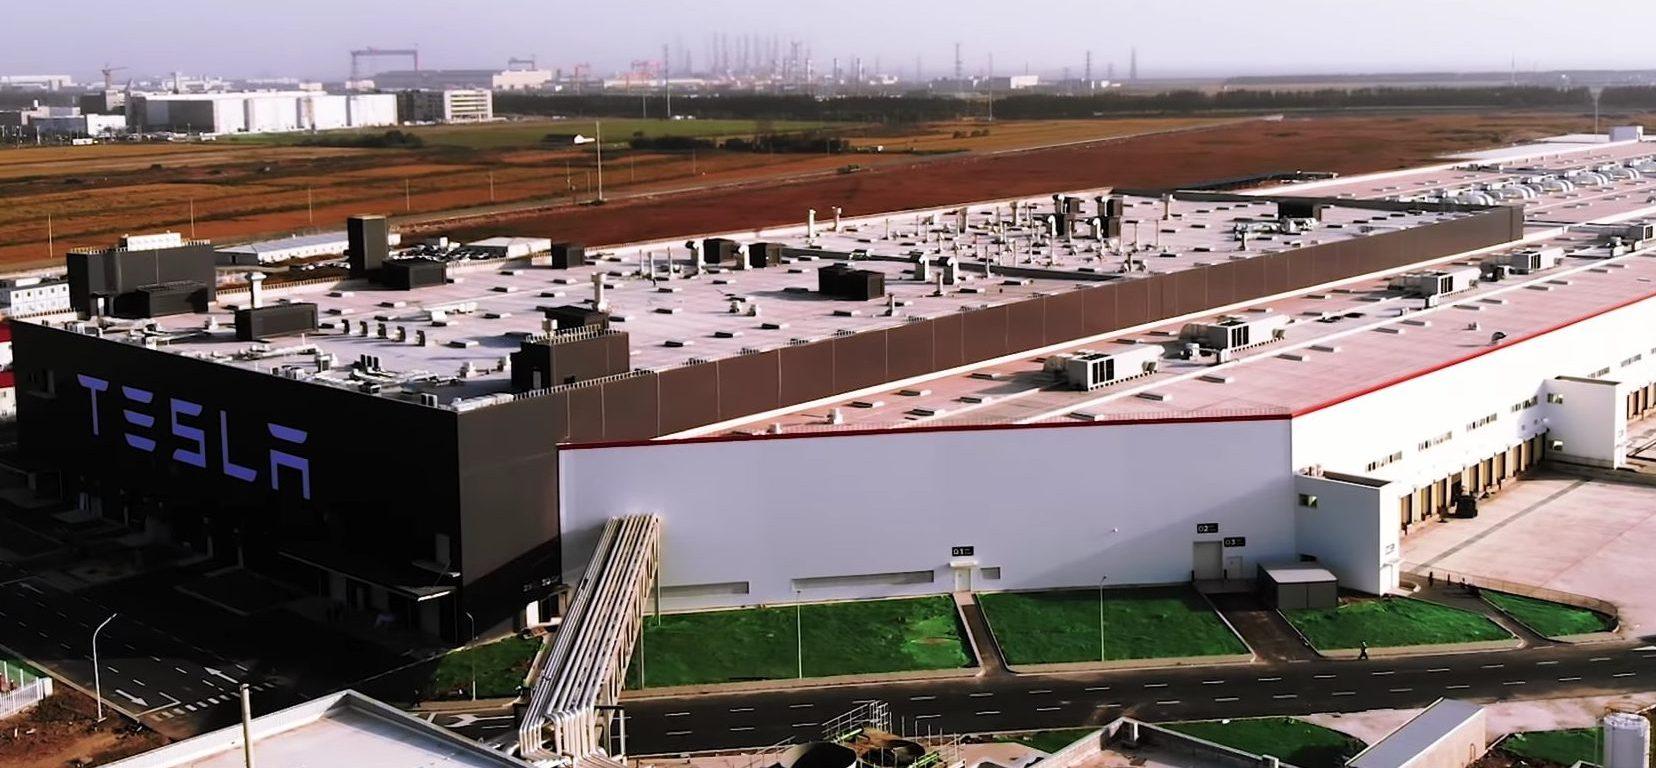 tesla-gigafactory-3-phase-2-roofing-model-3-trial-units